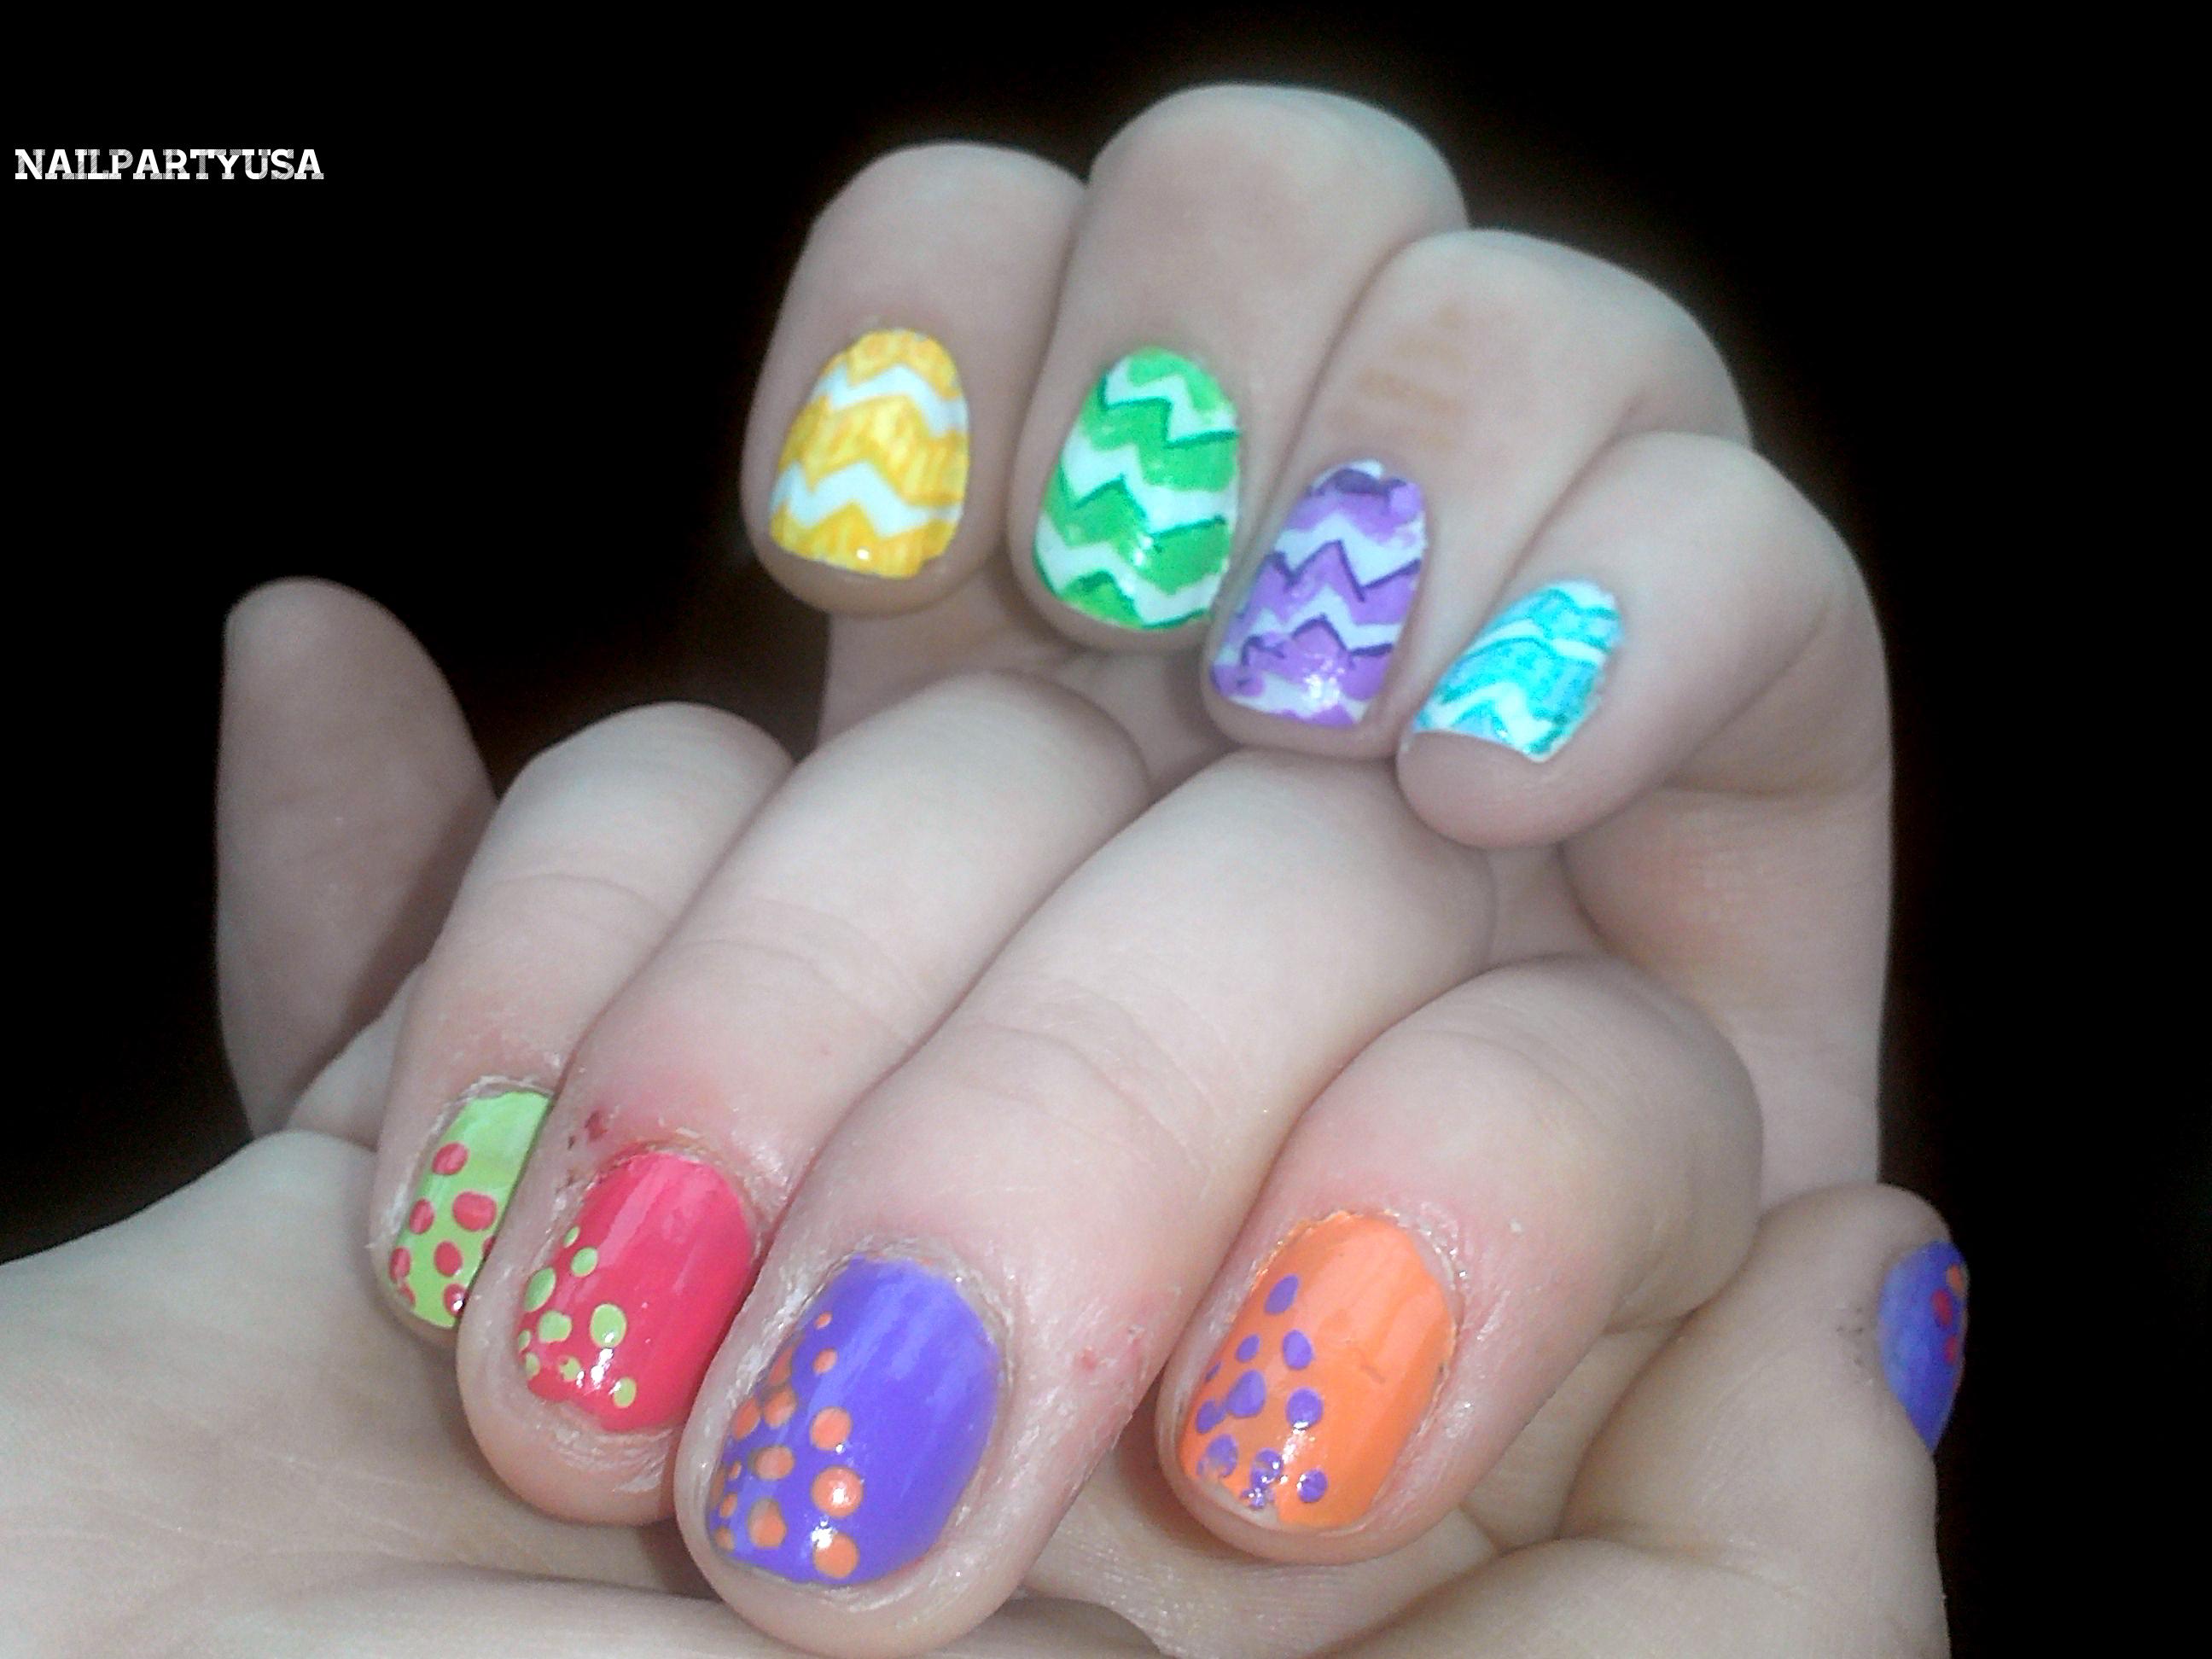 Cute summer nail designs 2012 tagged cute nails cute spring nail design cute spring nails easter nails prinsesfo Images